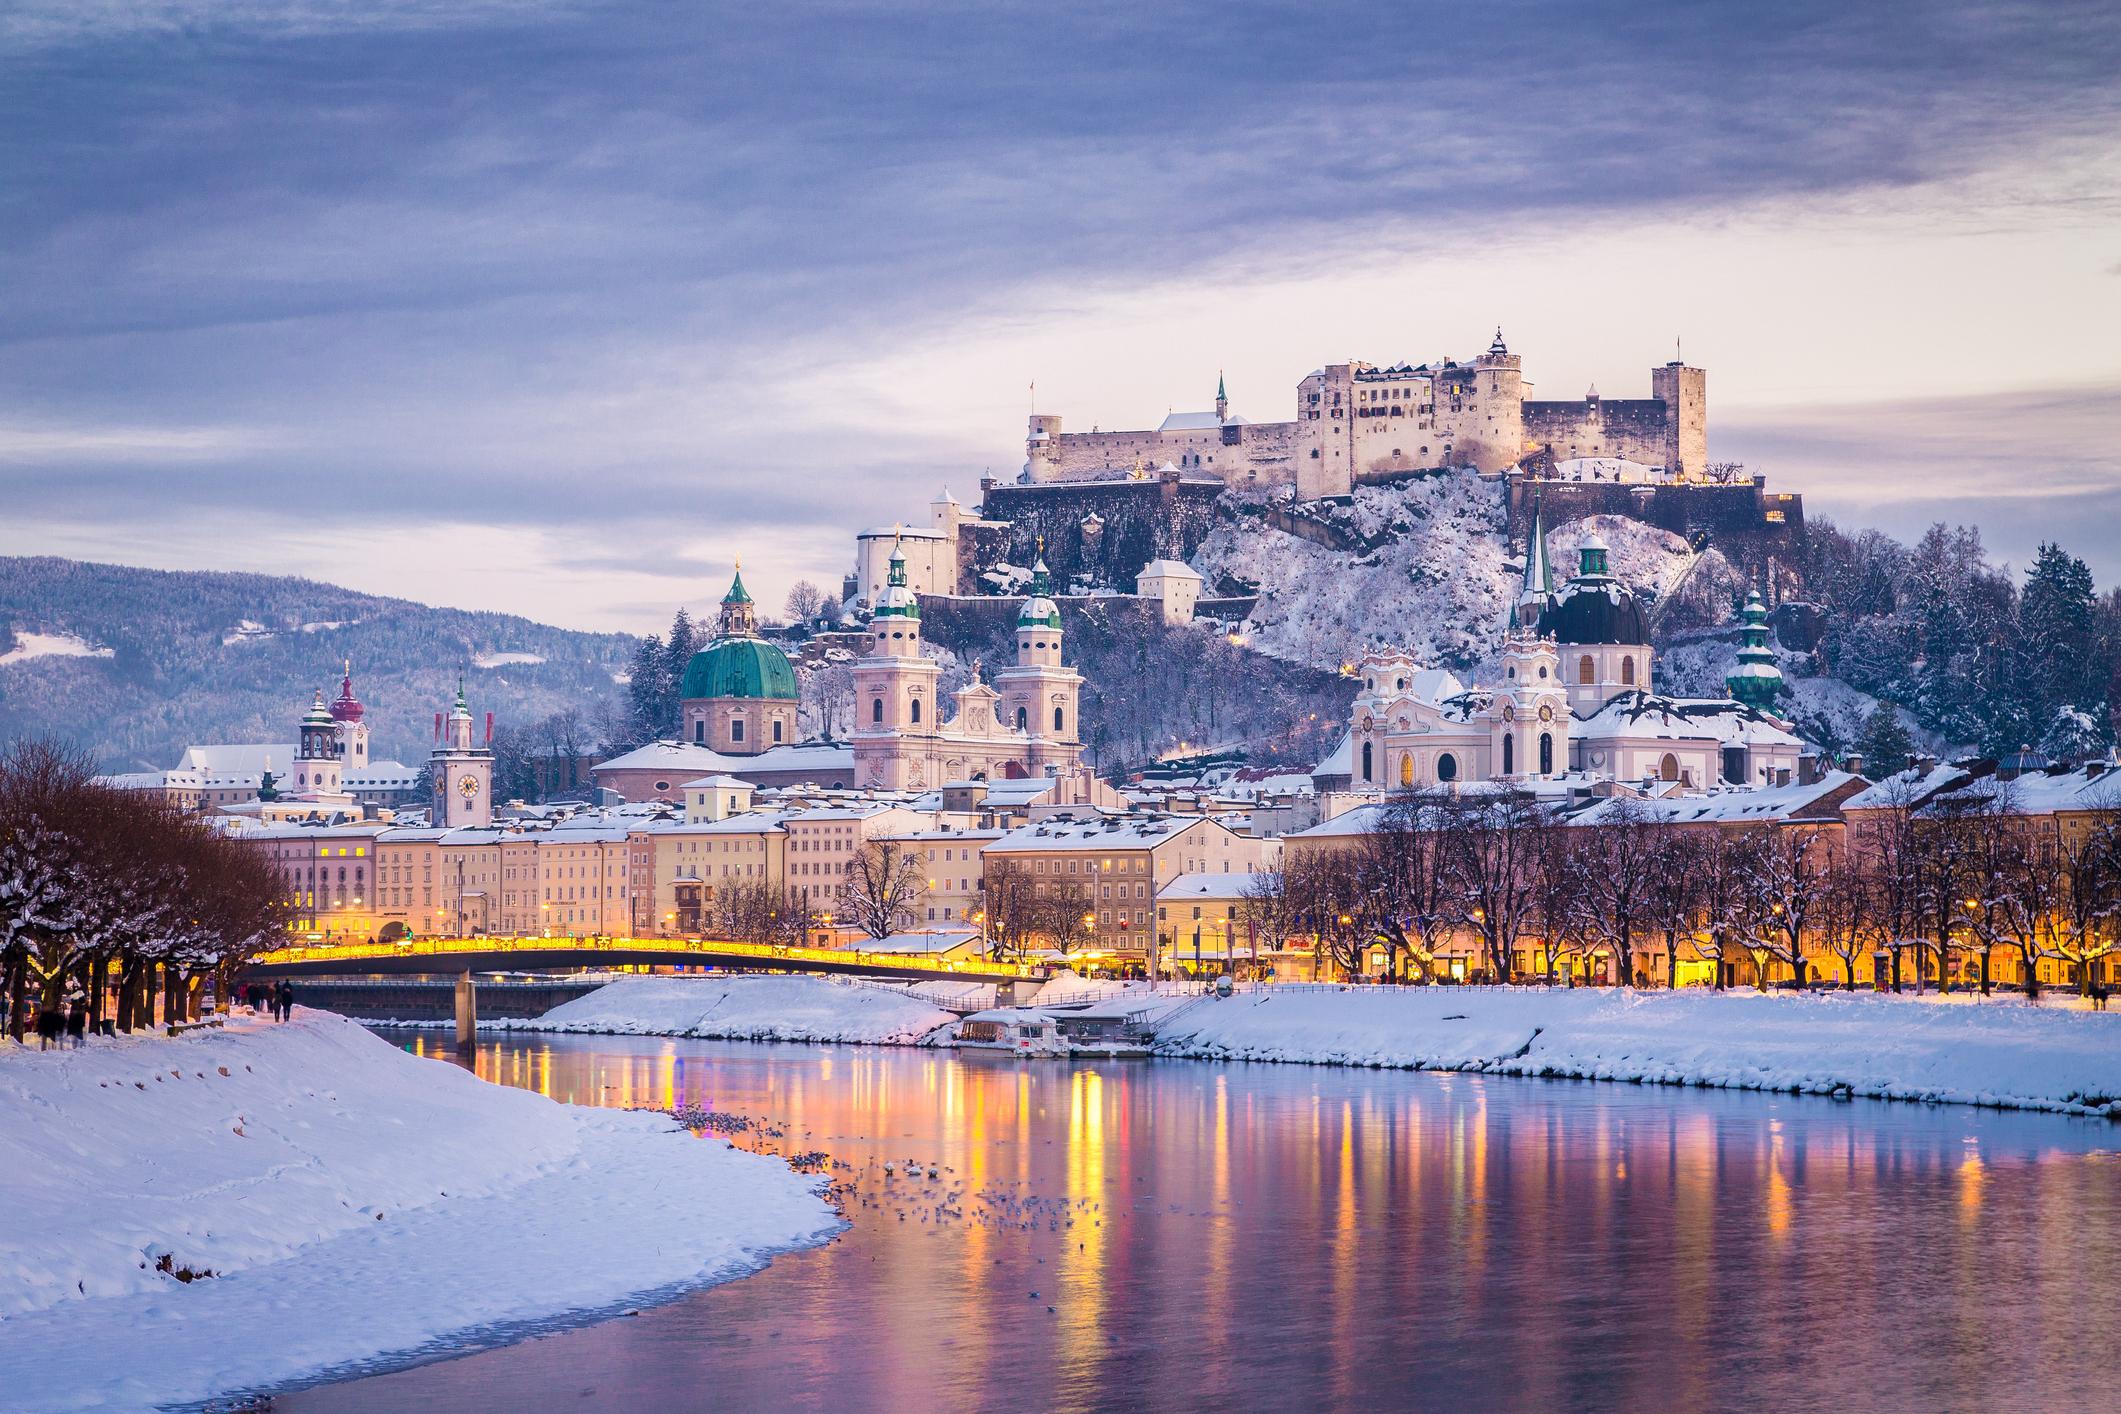 Os mais belos (e antigos) mercados de Natal da Europa | Unibanco